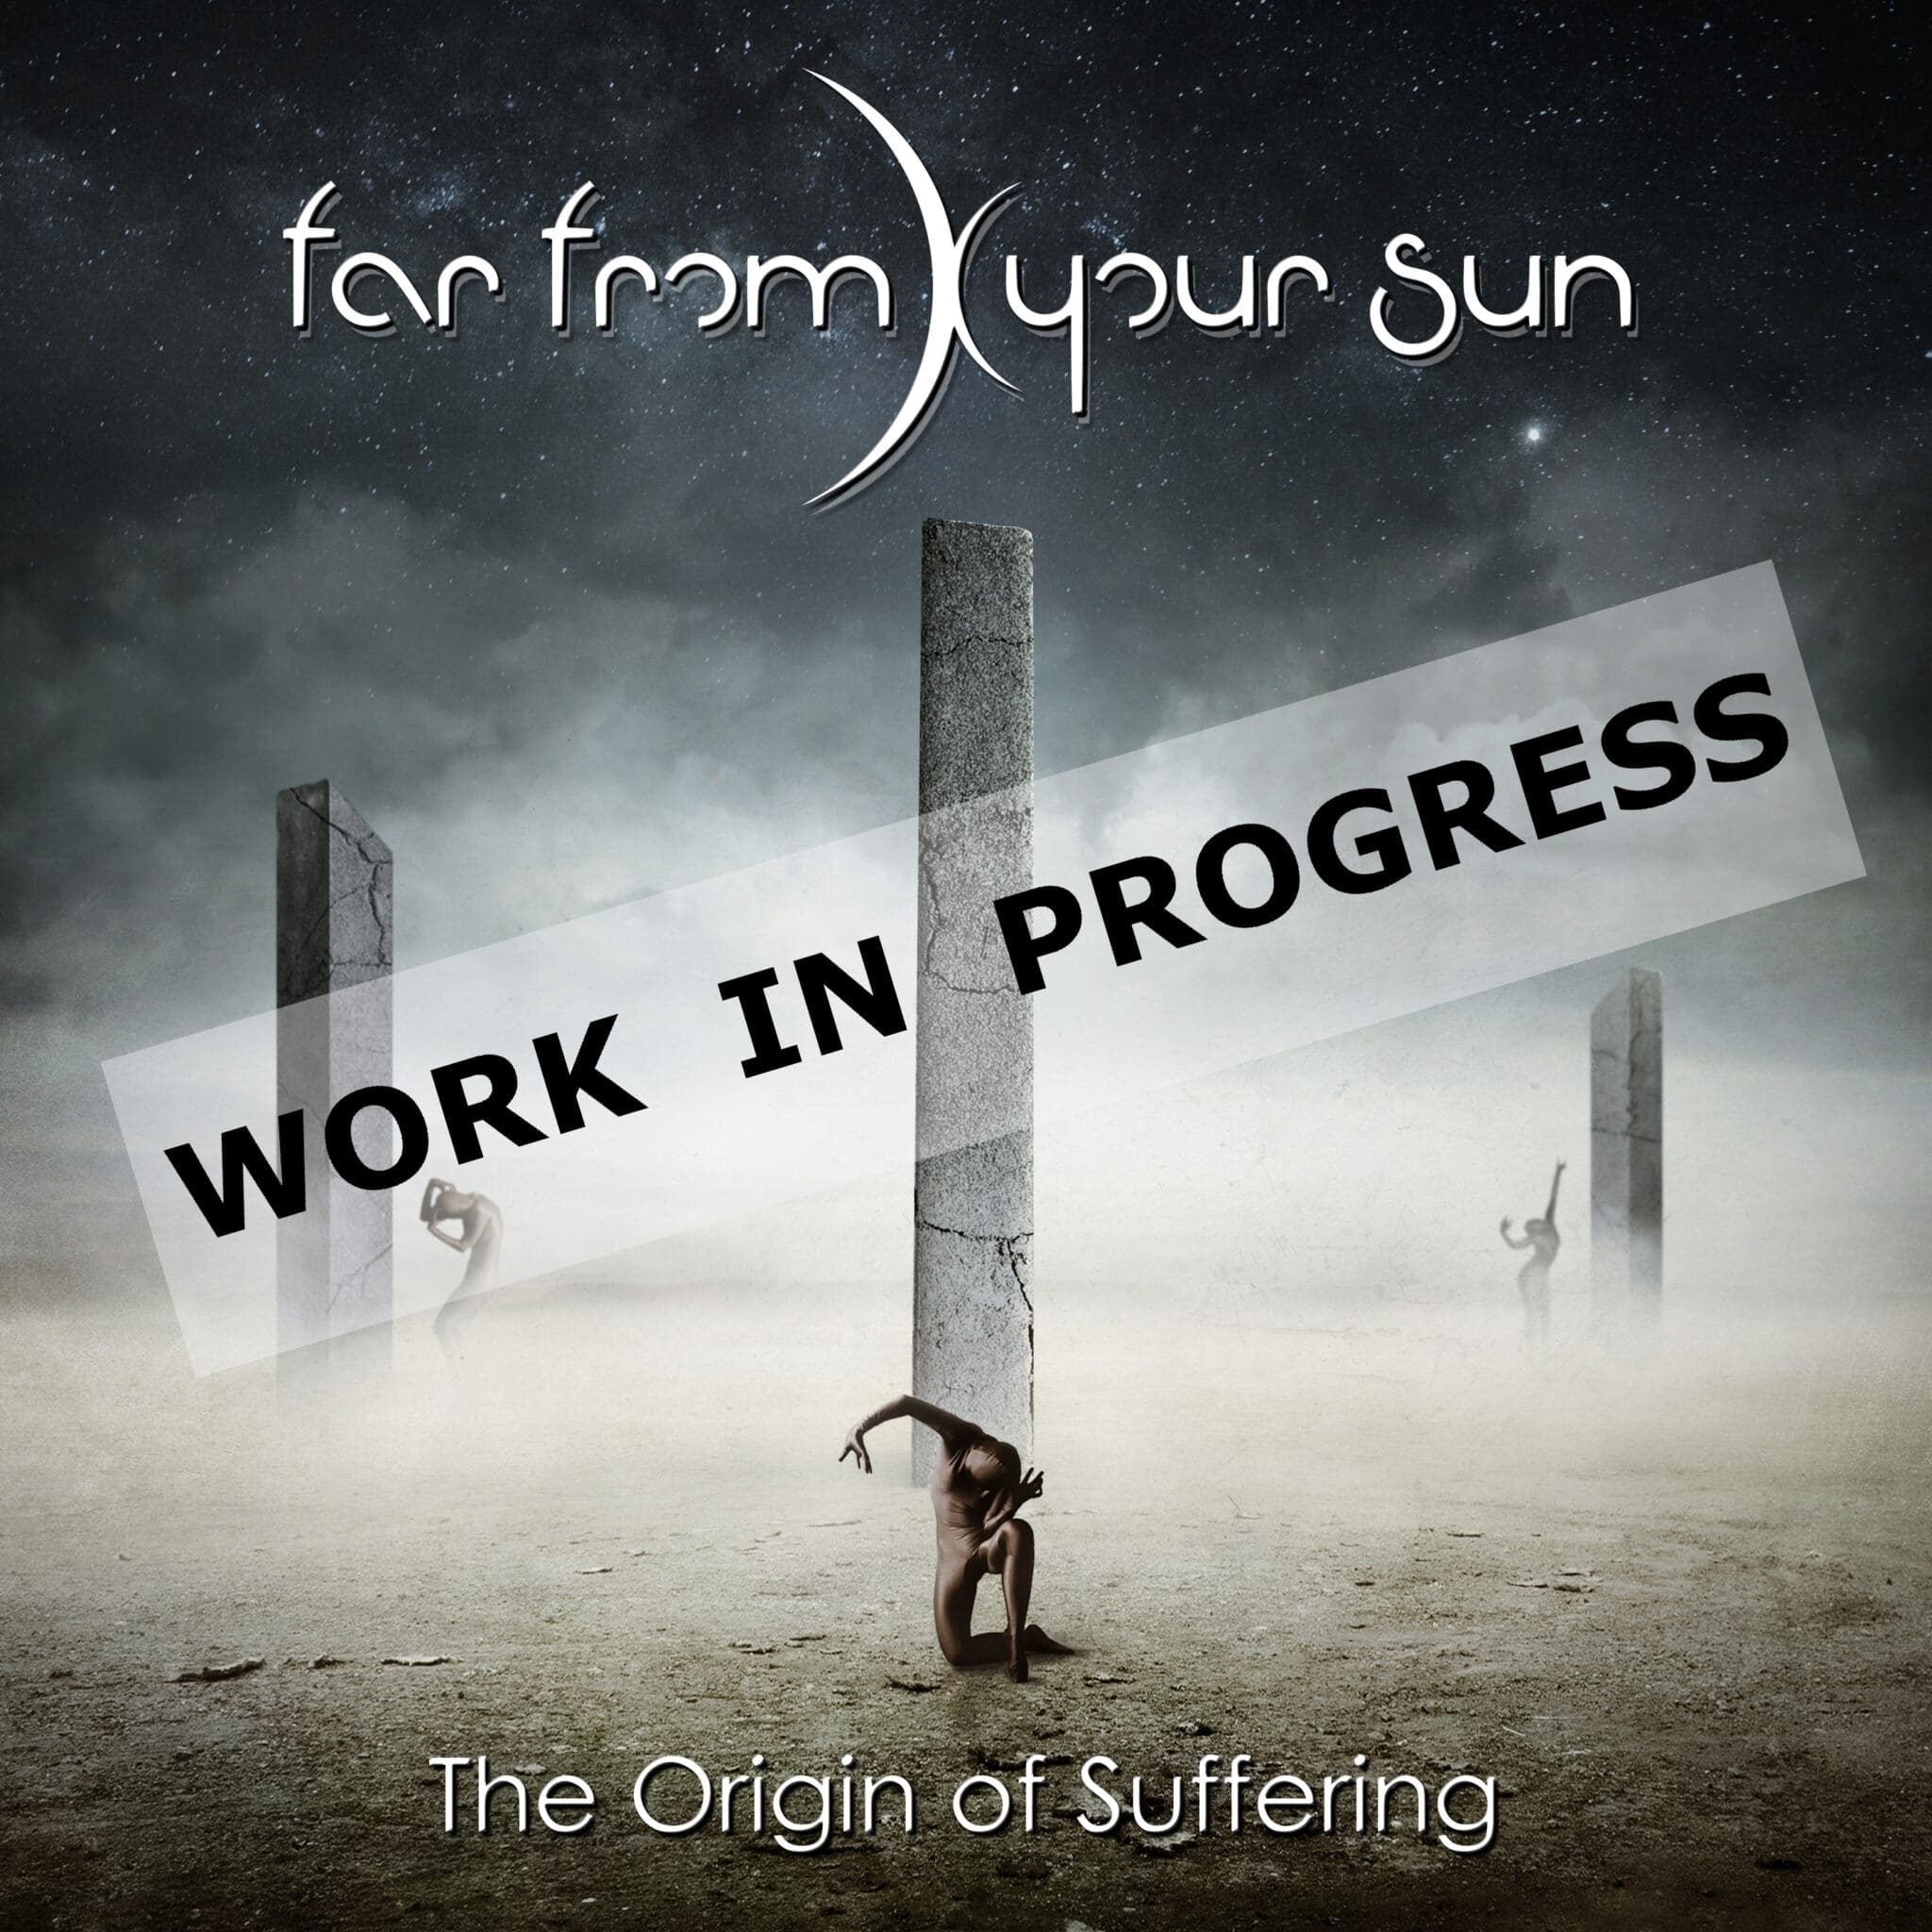 Far From Your Sun - The origin of suffering - work in progress